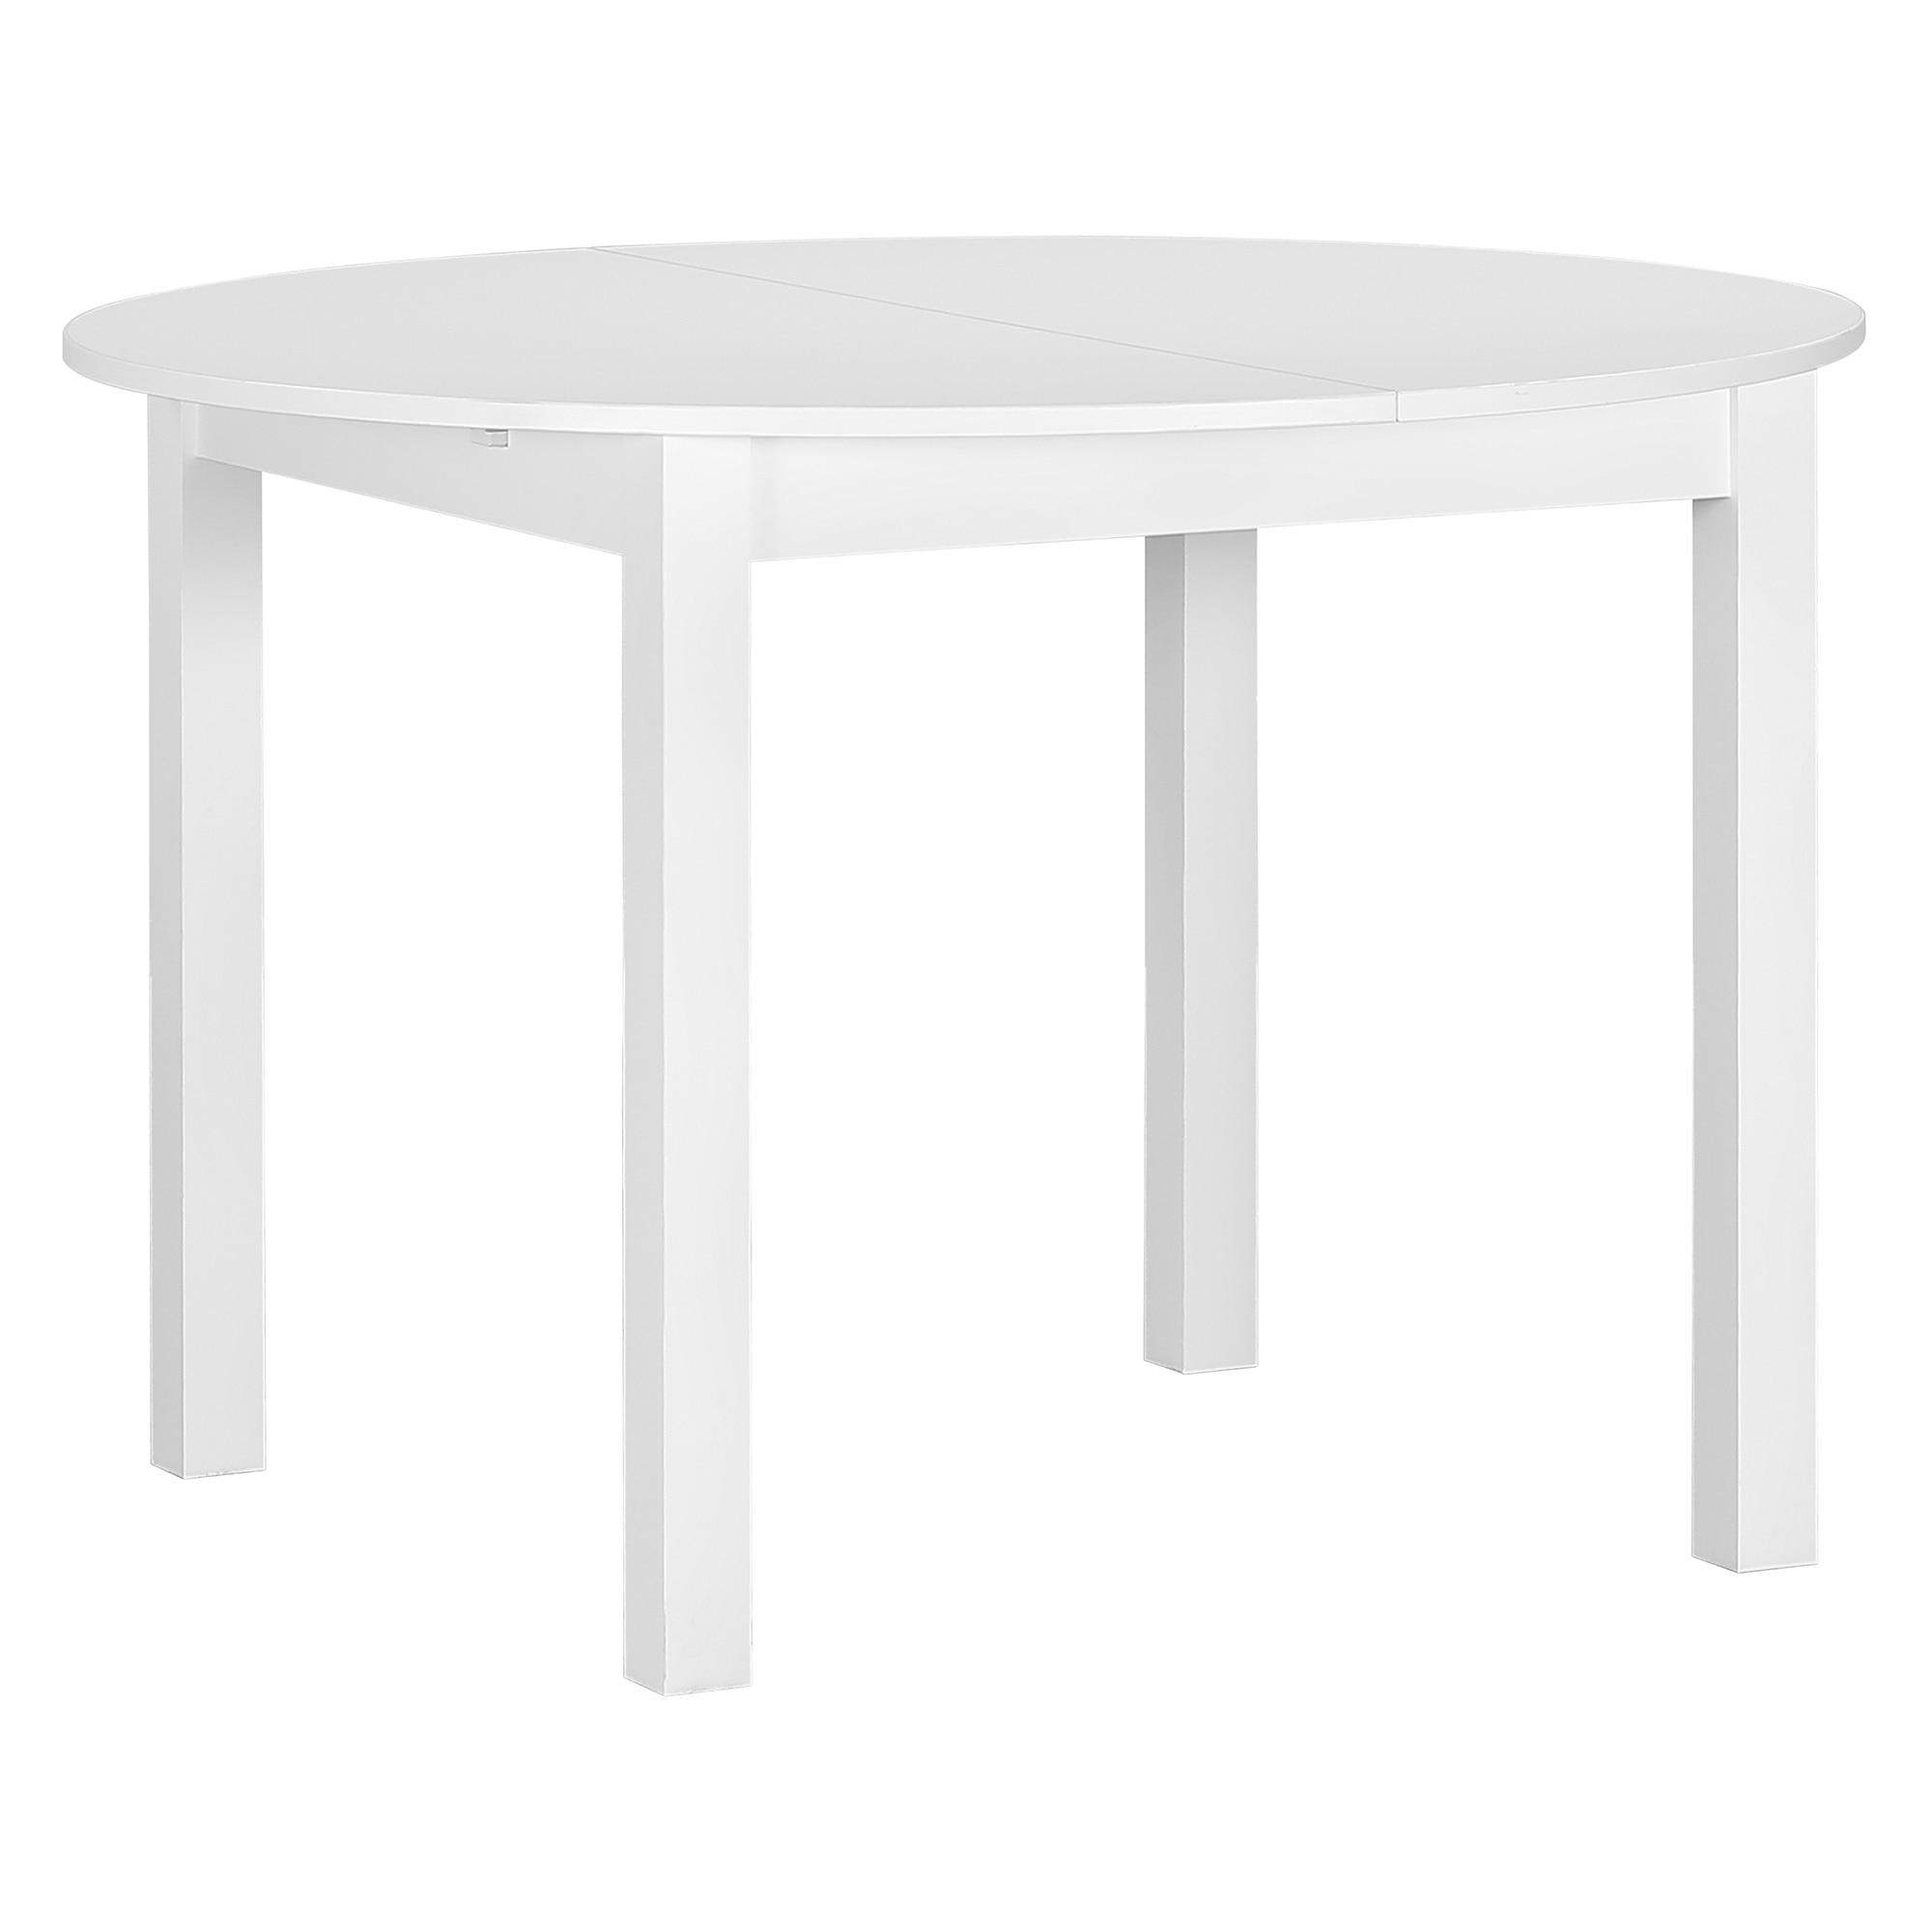 Fotografie Masa extensibila Kring Round, 110/150 x 75 x 110 cm, alb